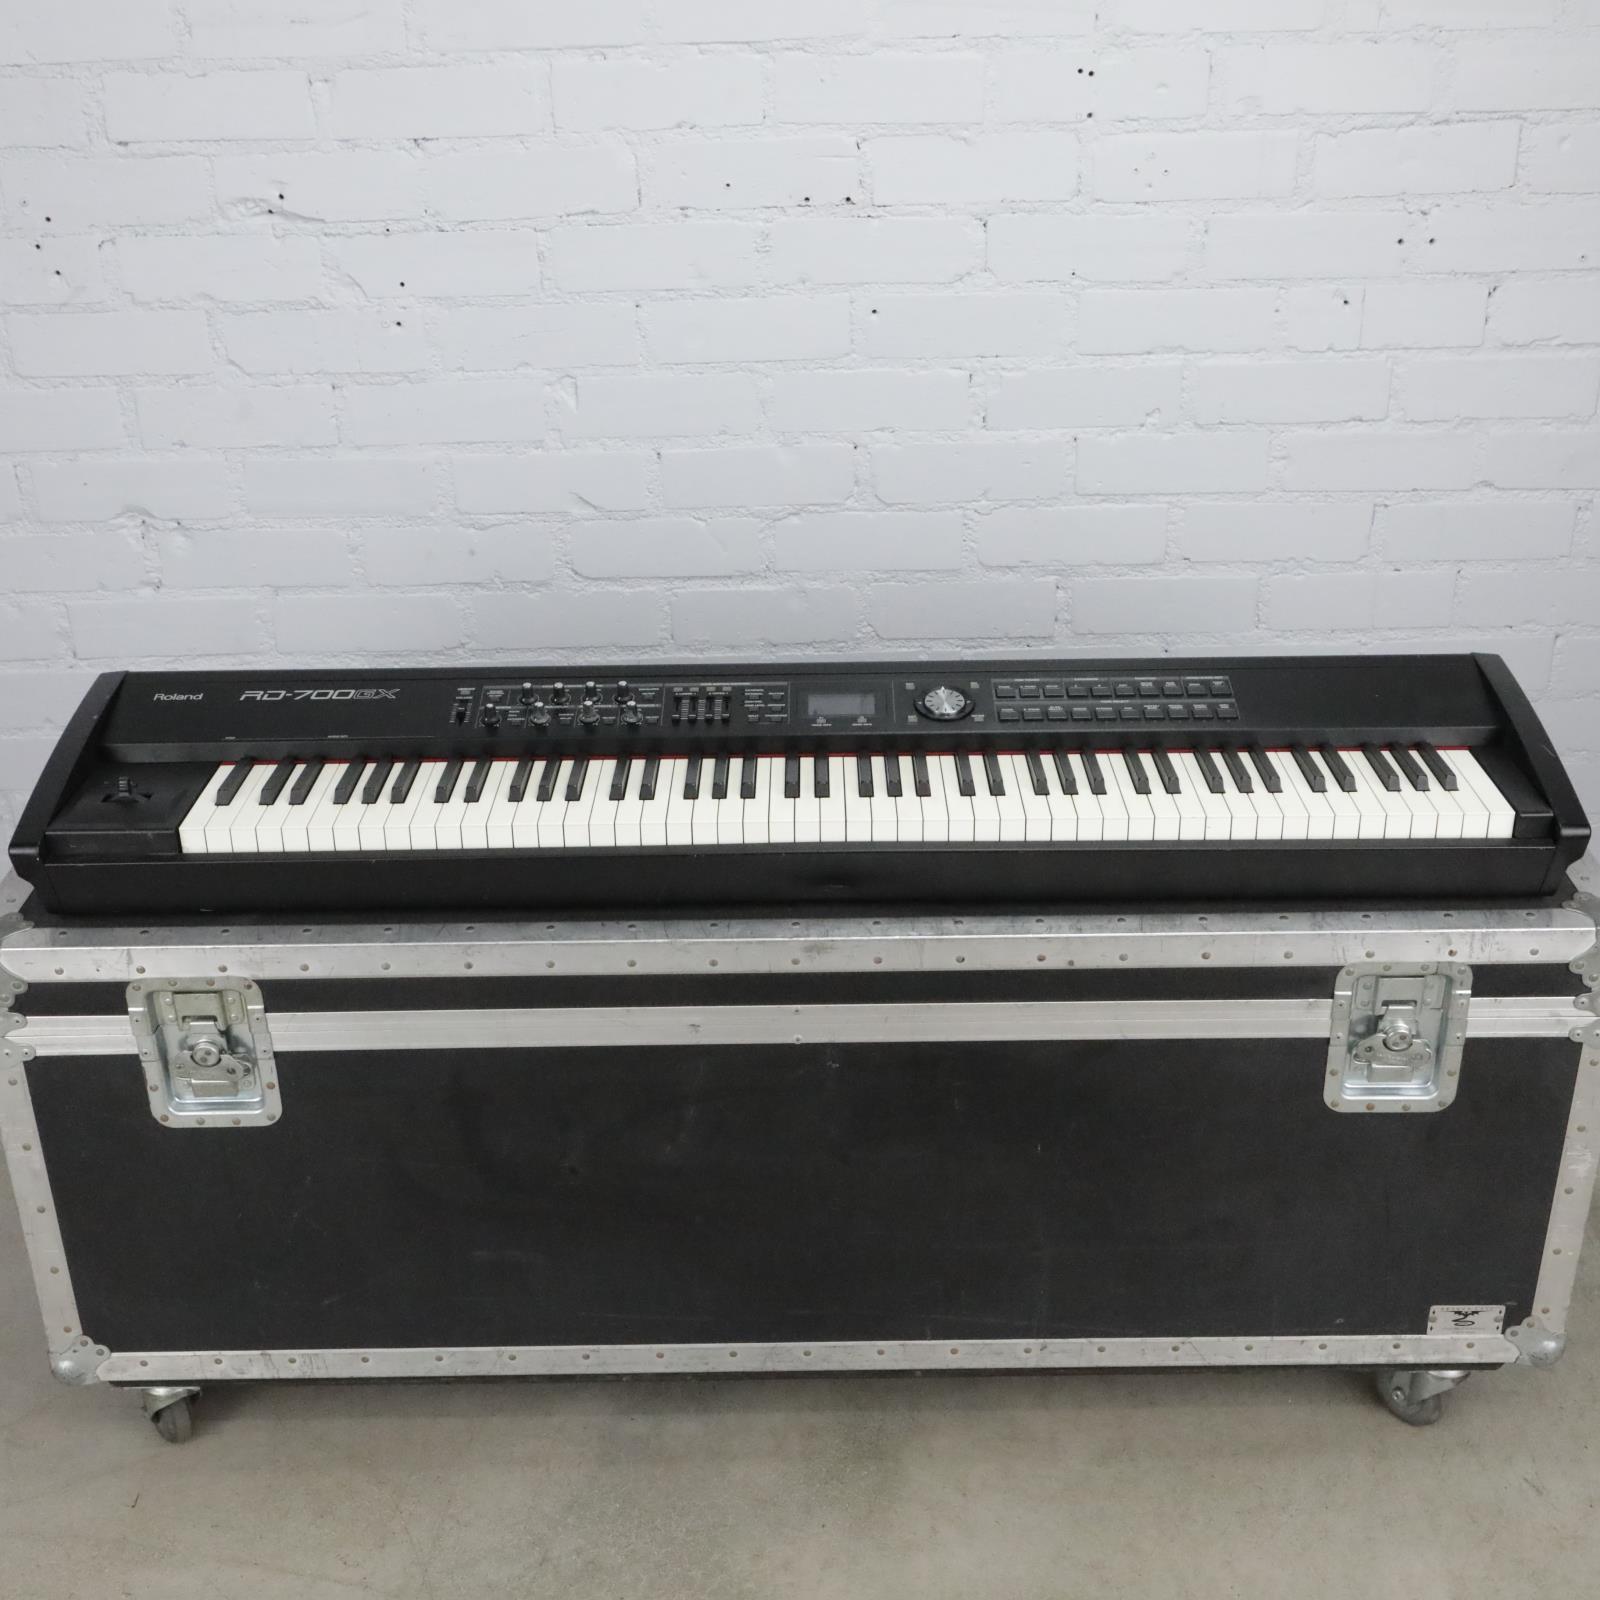 Roland RD-700GX 88 Note Keyboard w/ Case & EV-5 Expression Sustain Pedals #40697